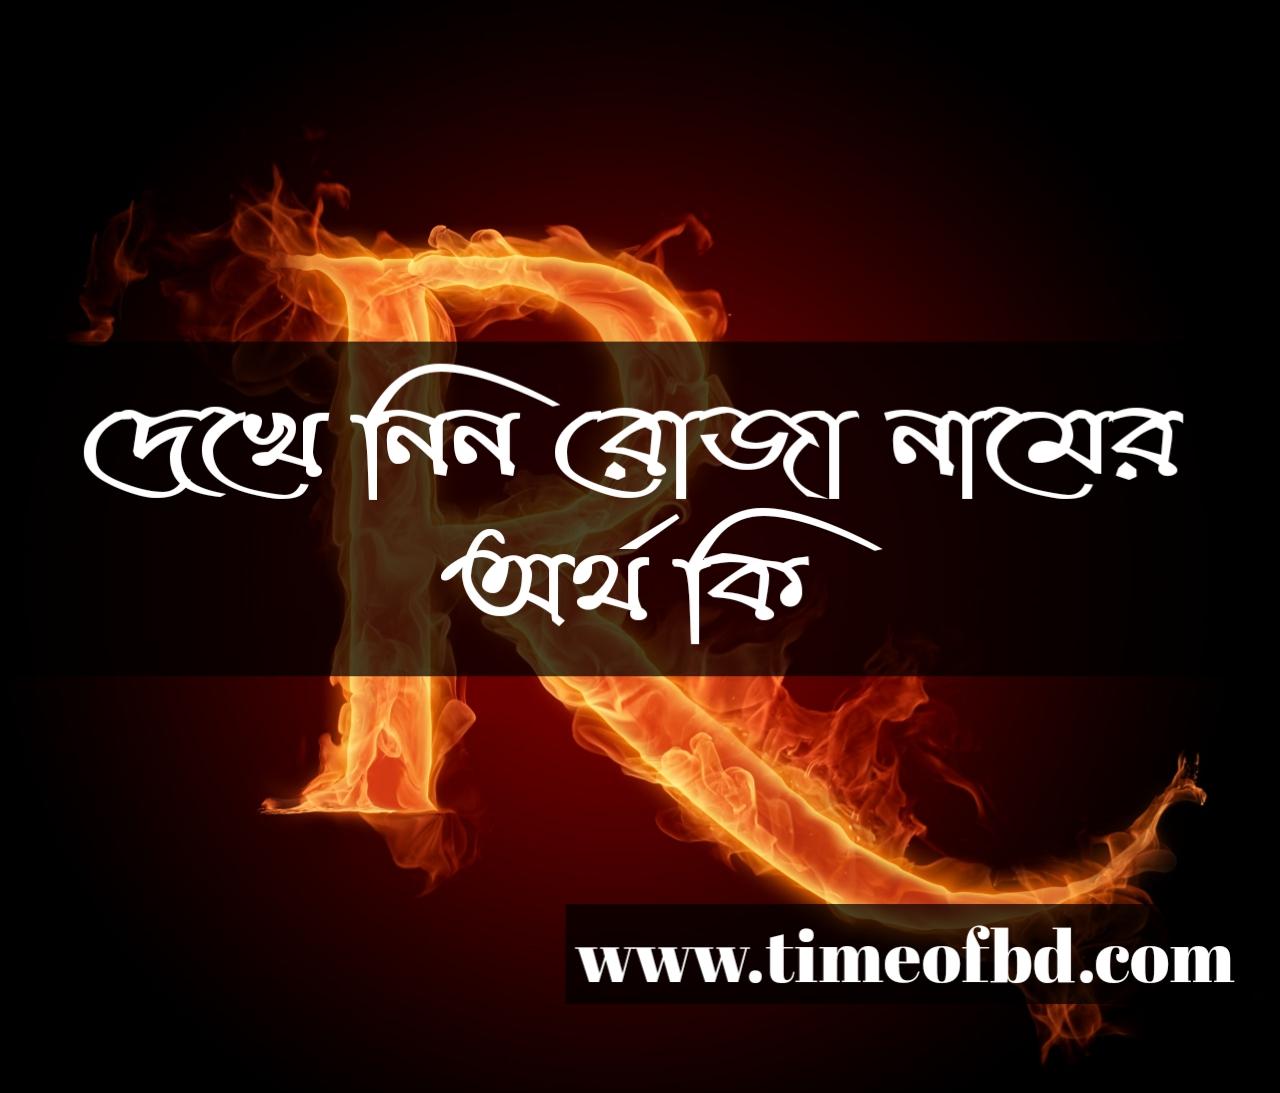 roja name meaning in Bengali, রোজা নামের অর্থ কি, রোজা নামের বাংলা অর্থ কি, রোজা নামের ইসলামিক অর্থ কি,